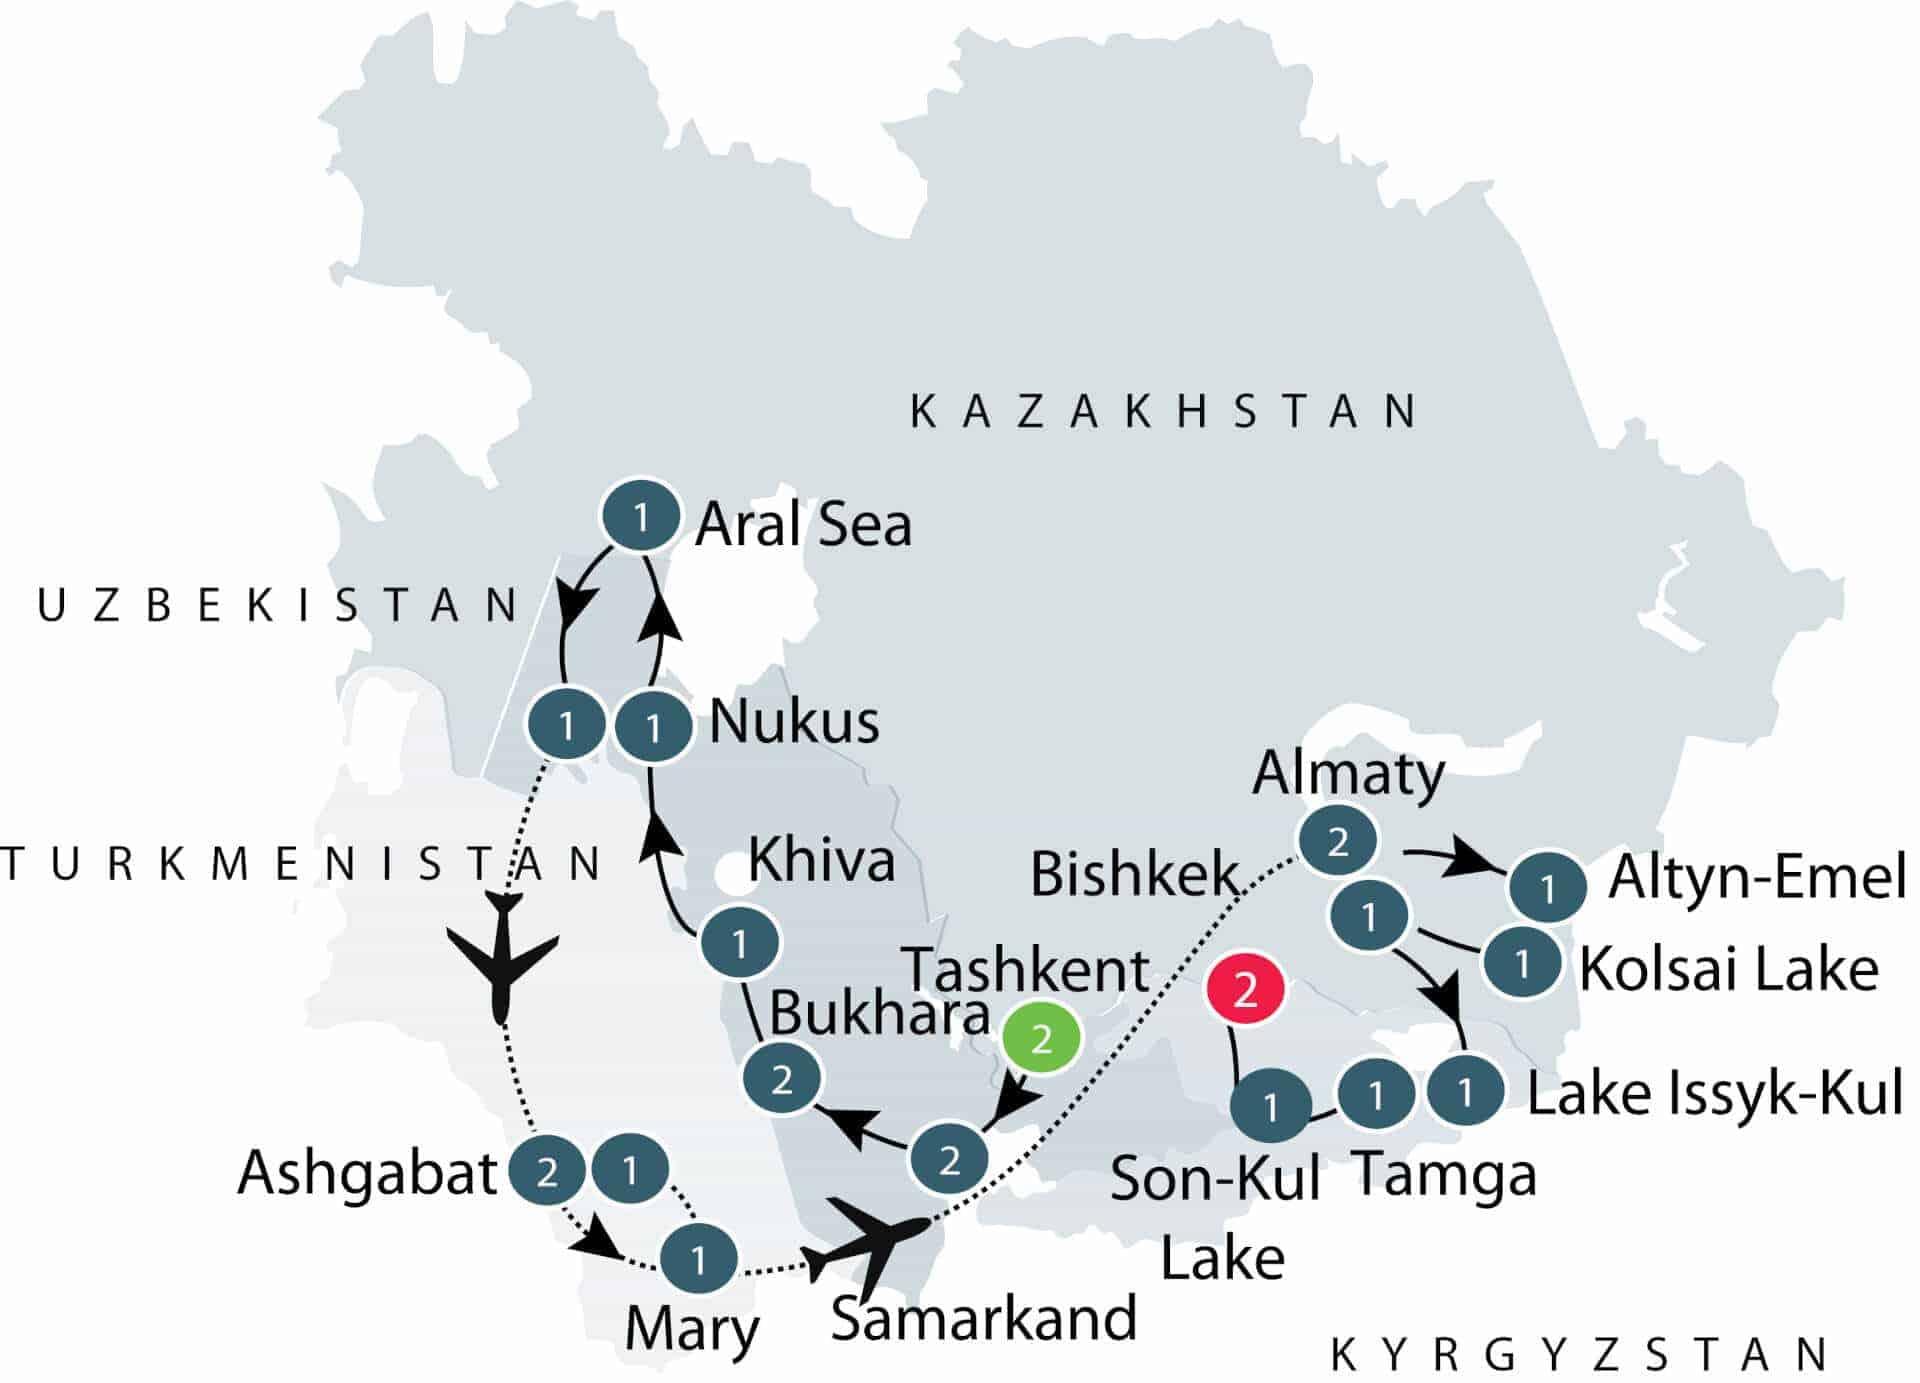 Map of Odyssey to the Stans, Turkmenistan, Uzbekistan, Kazakhstan, Kyrgyzstan